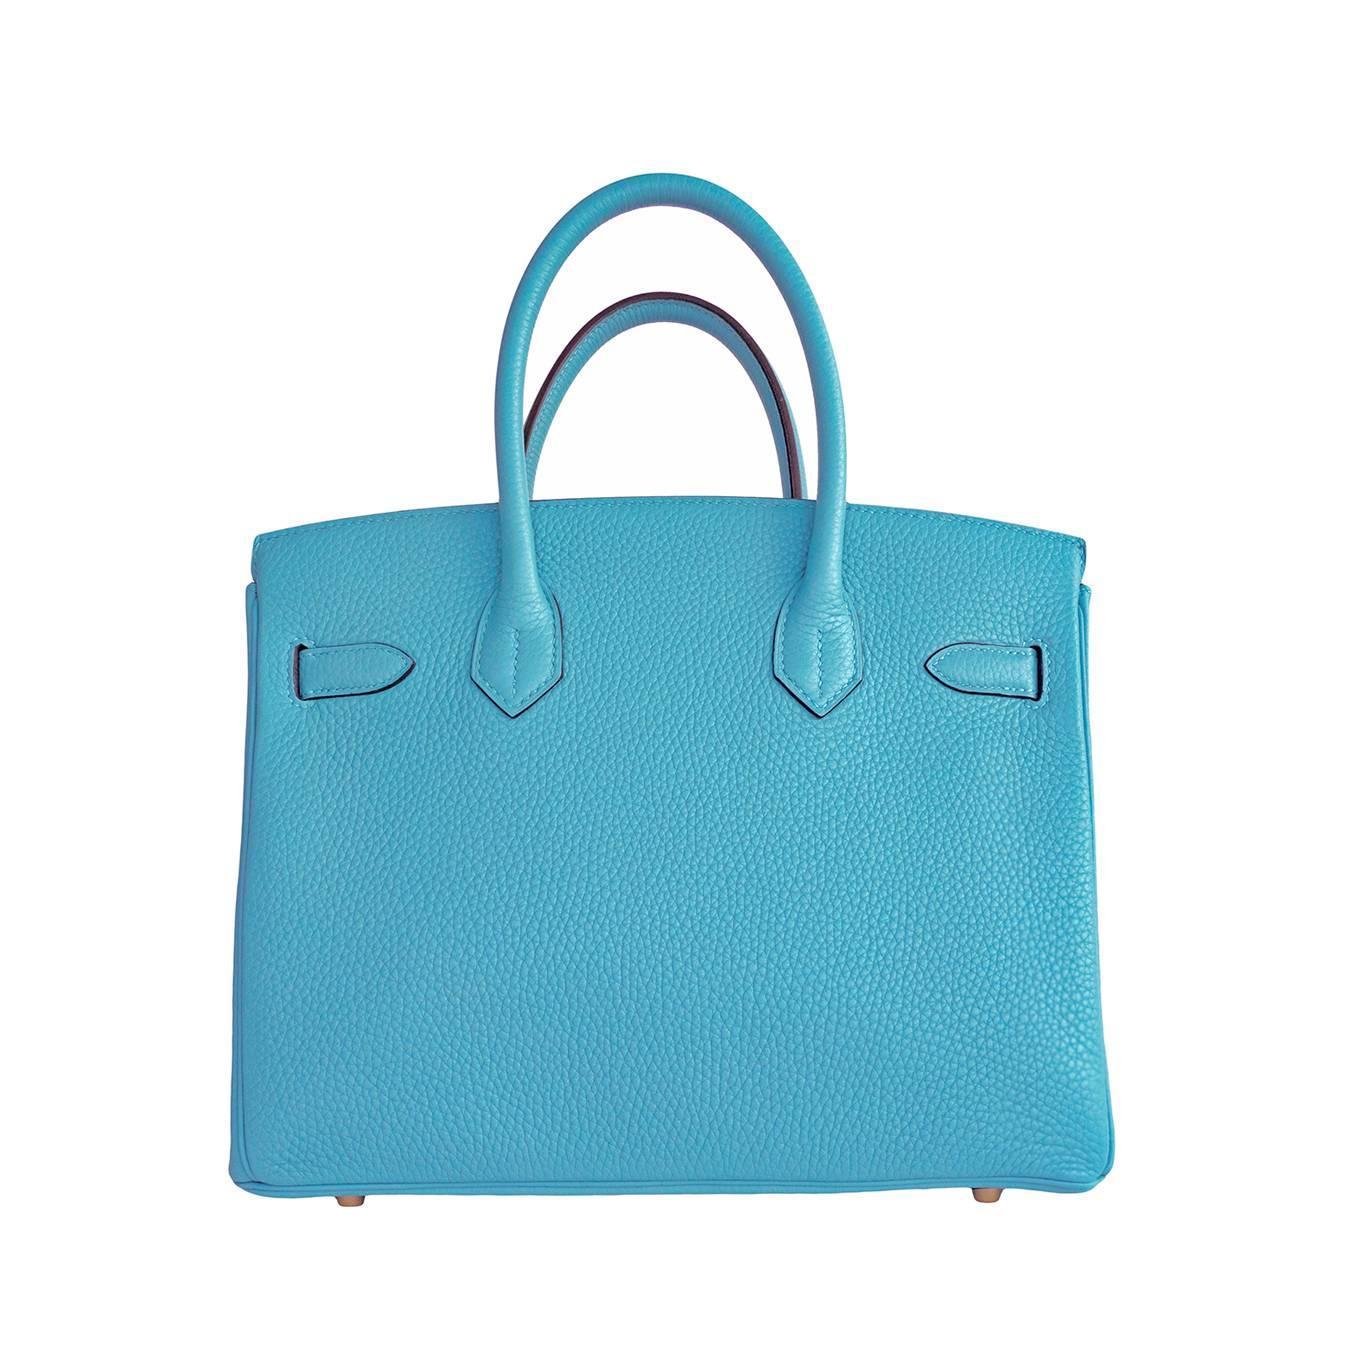 knock off birkin - Hermes Blue Saint Cyr Clemence Birkin 30cm Gold Hardware For Sale ...